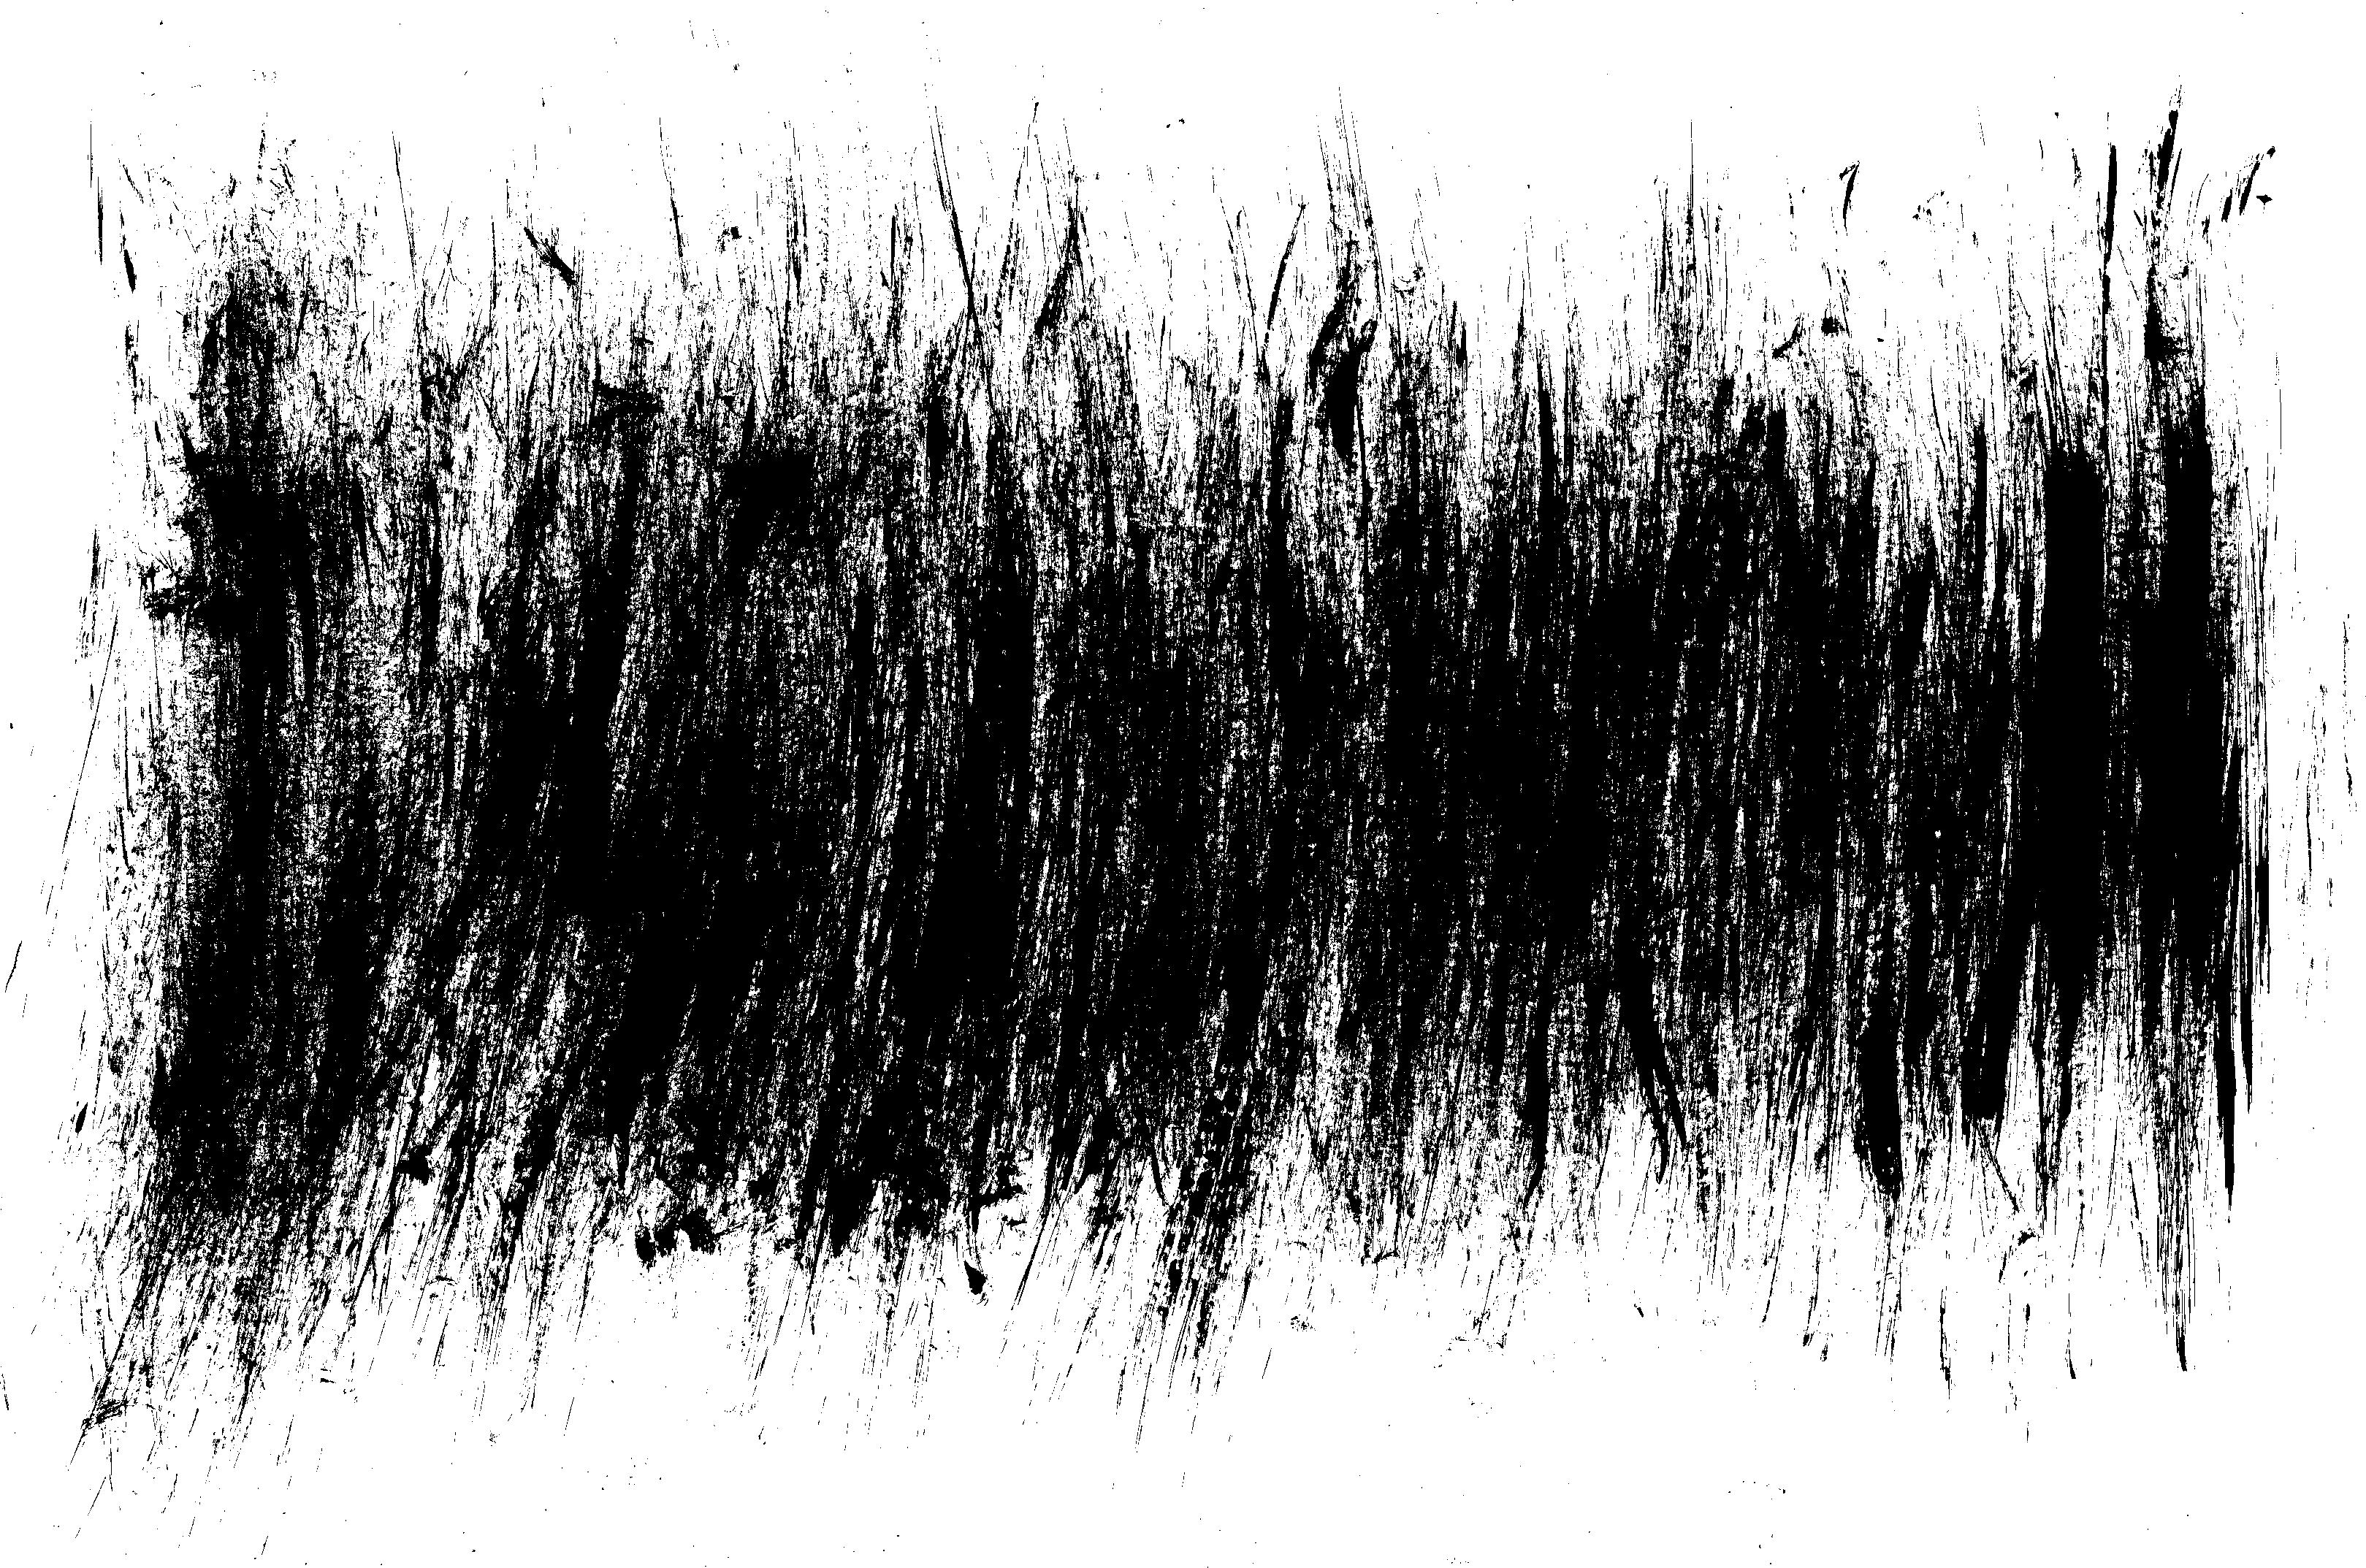 22 Grunge Overlay (PNG Transparent) Vol. 3   OnlyGFX.com